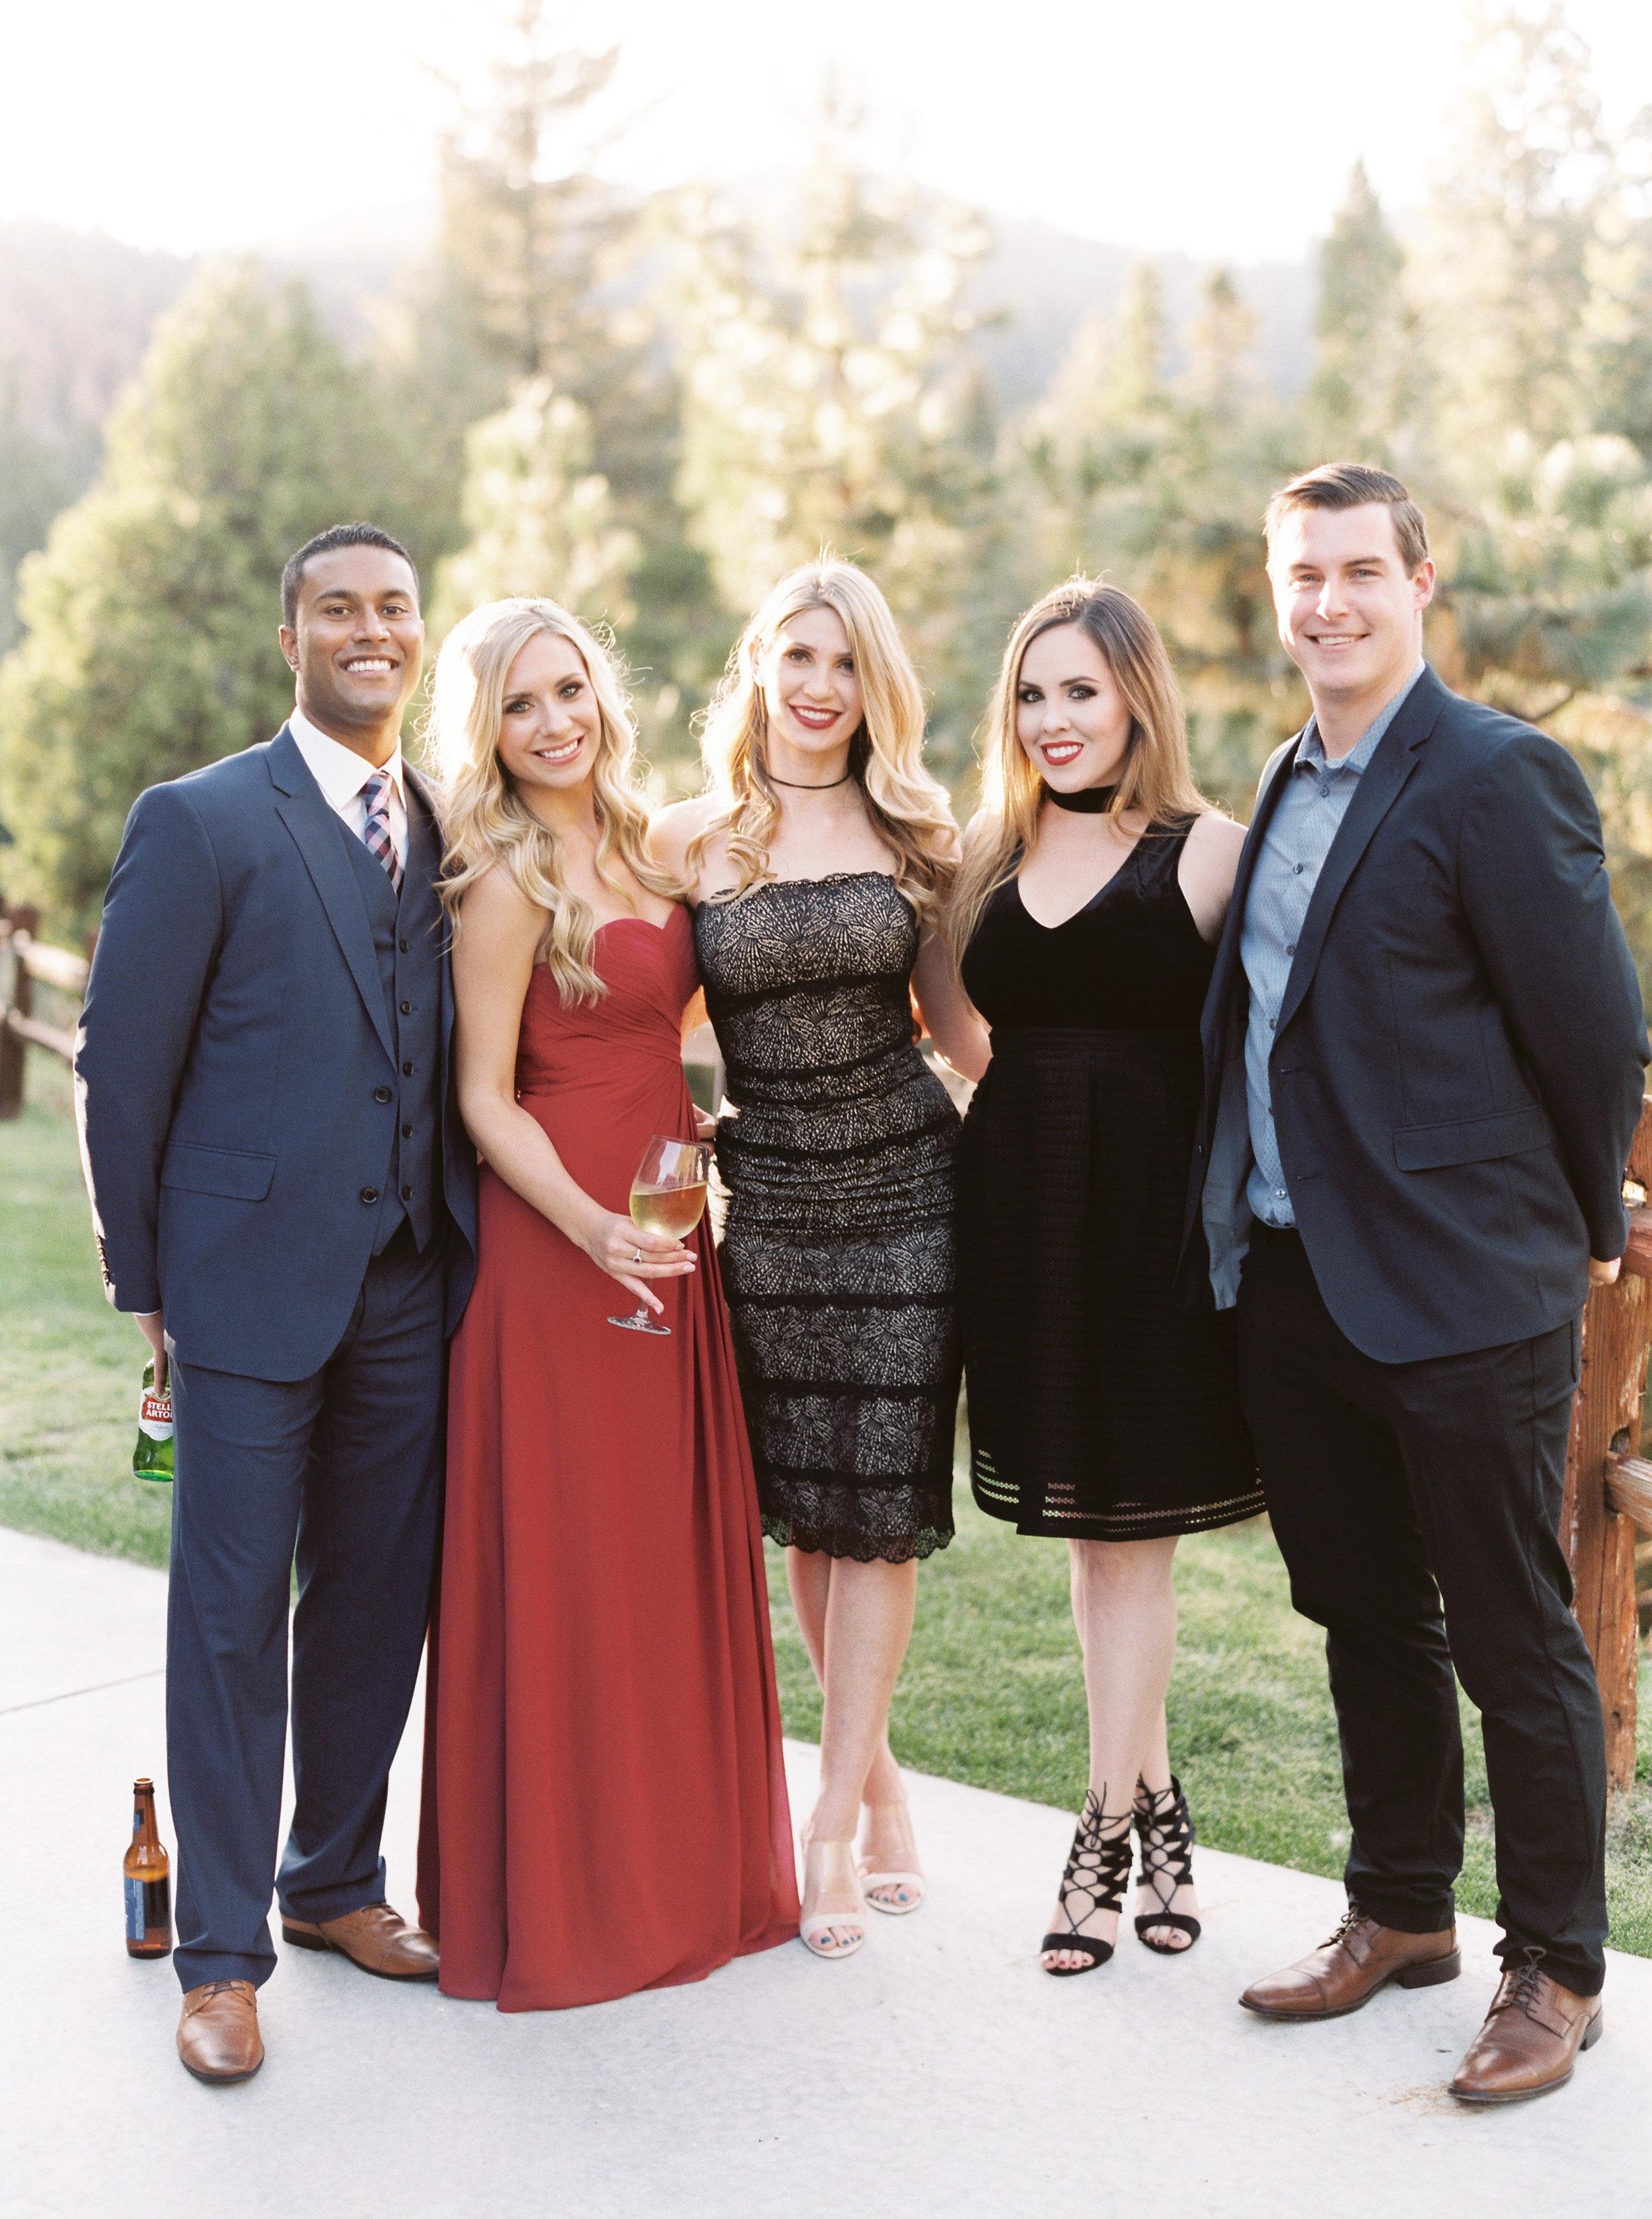 Tenaya-lodge-wedding-at-yosemite-national-park-california-52.jpg